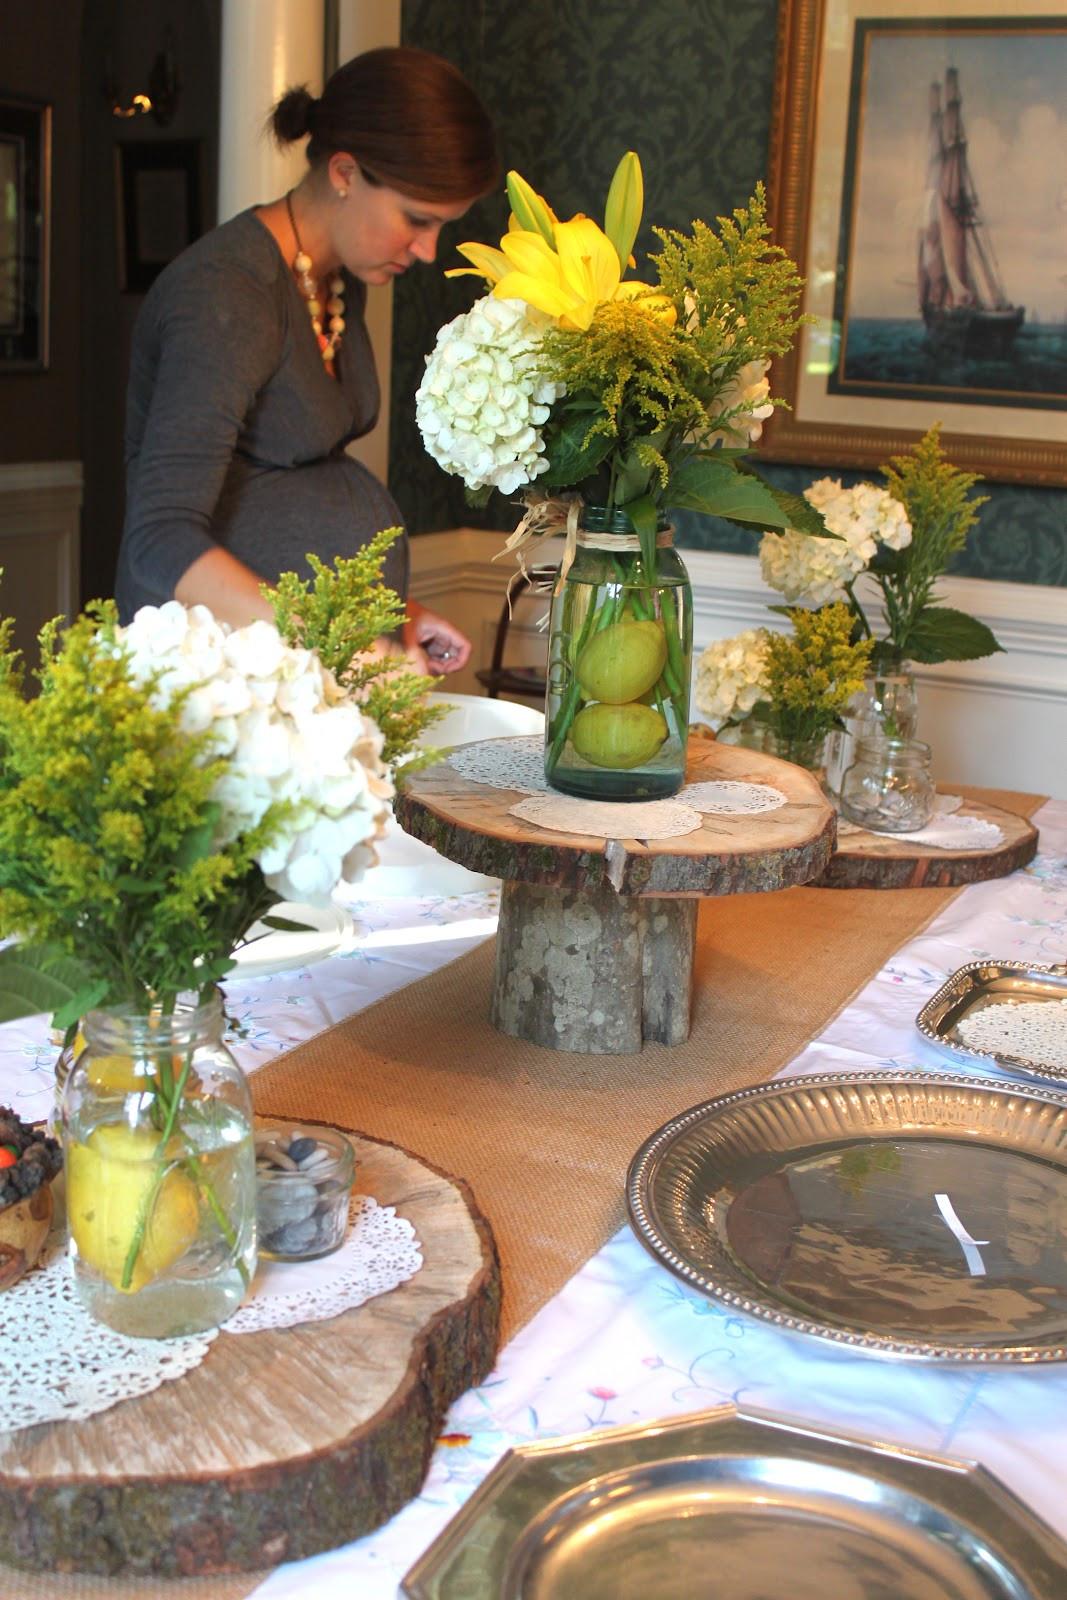 Centerpiece Ideas For Engagement Party  CREATE STUDIO A Rustic Feminine Wedding Shower